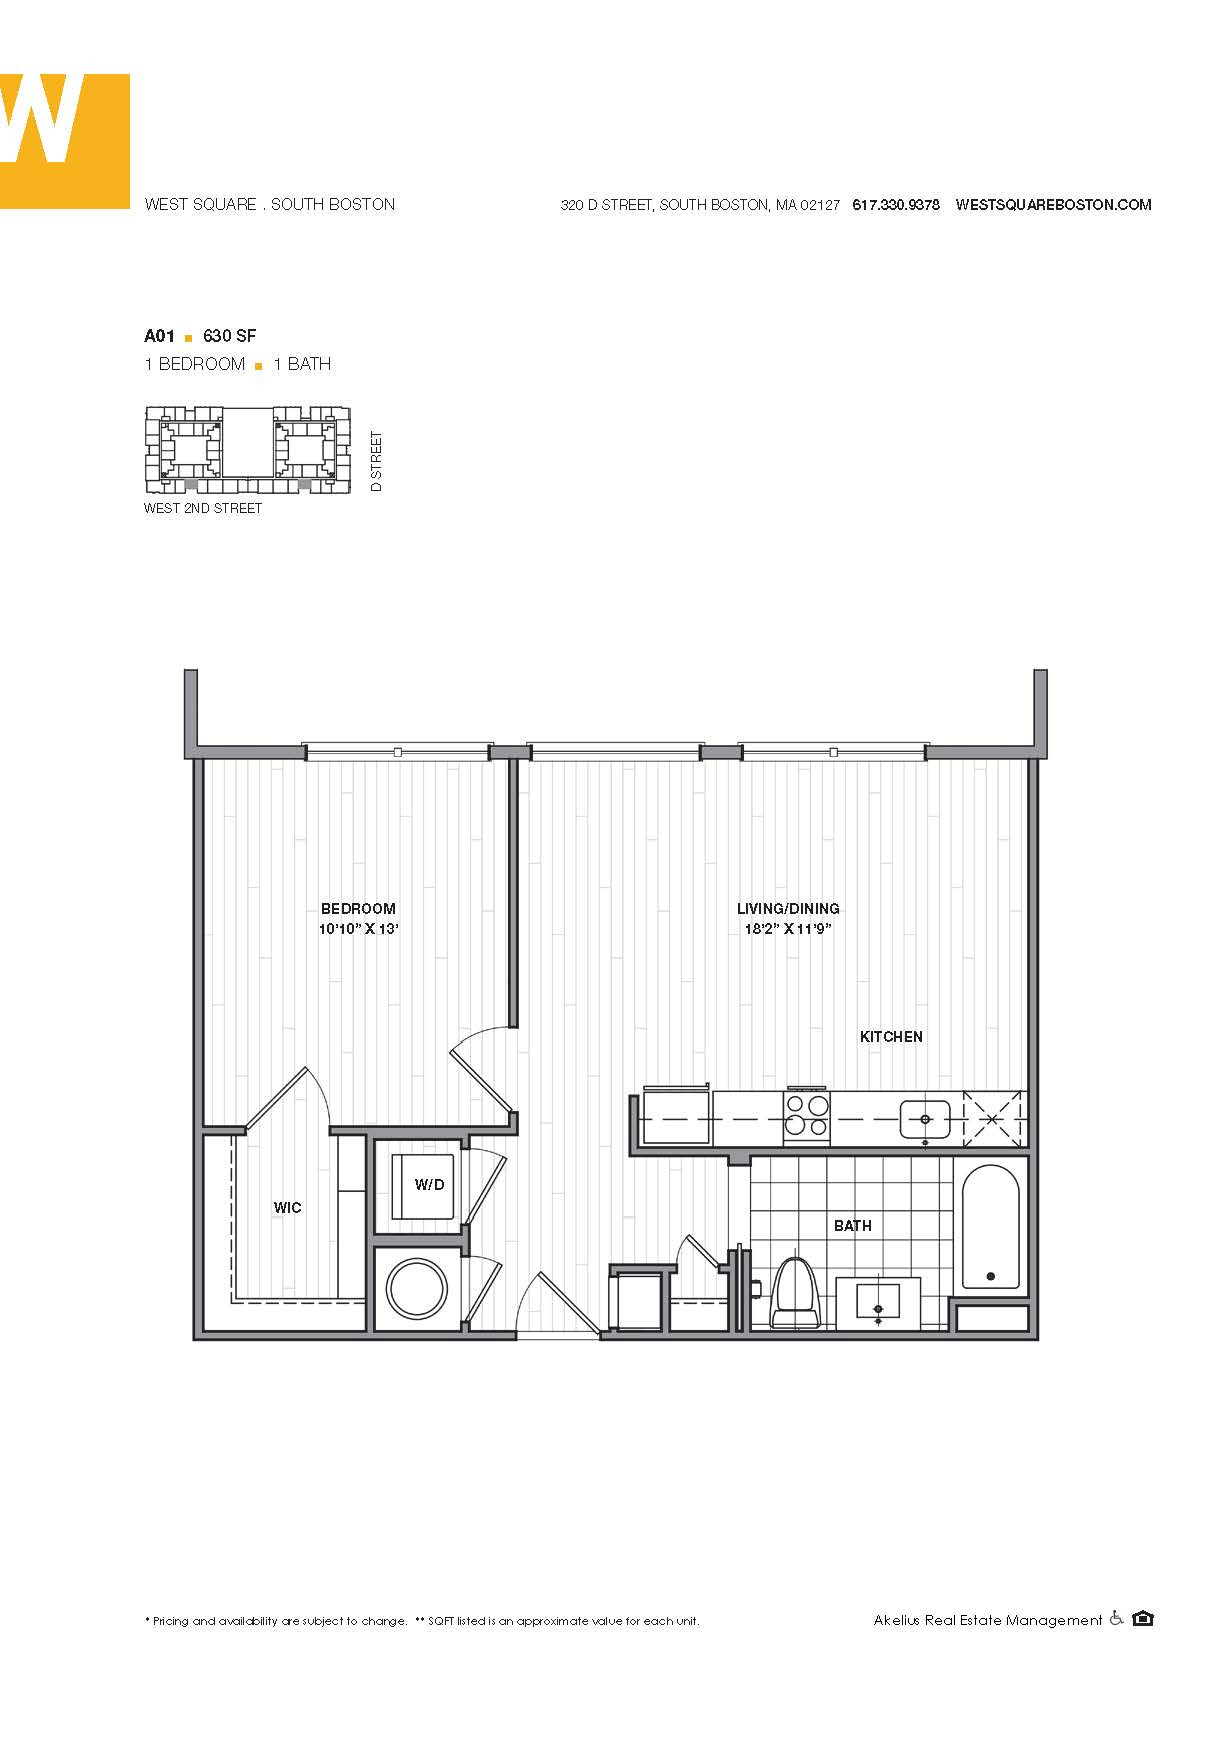 West Square Apartments